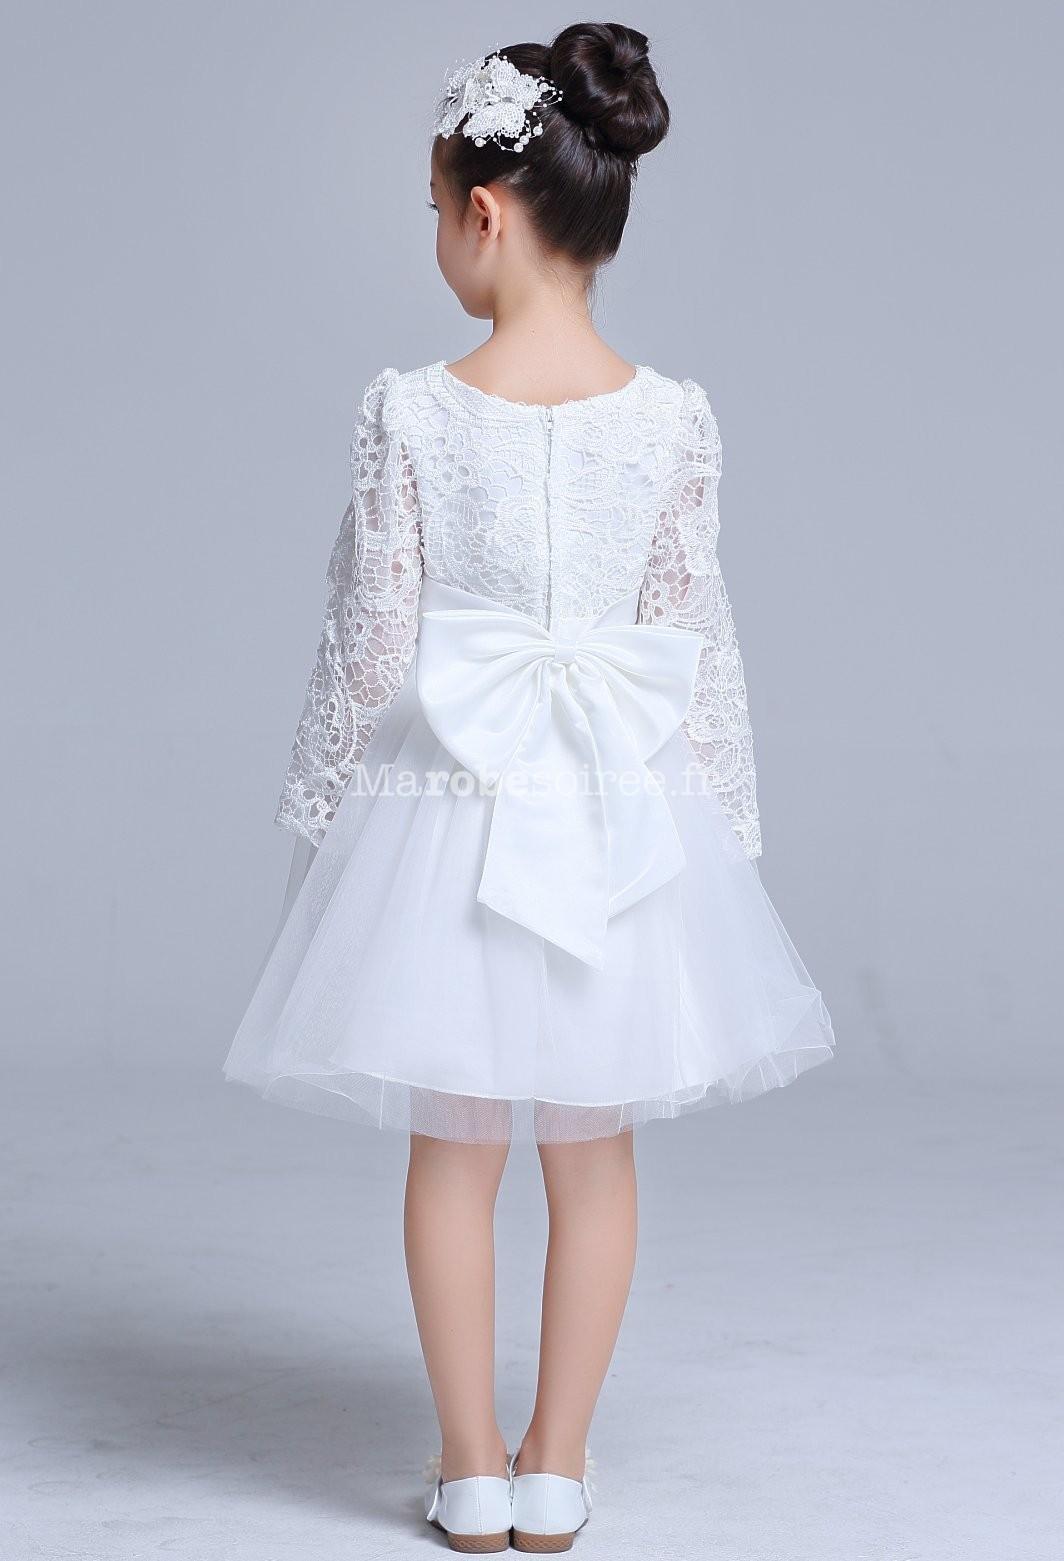 robe blanche b b fille pour bapt me. Black Bedroom Furniture Sets. Home Design Ideas